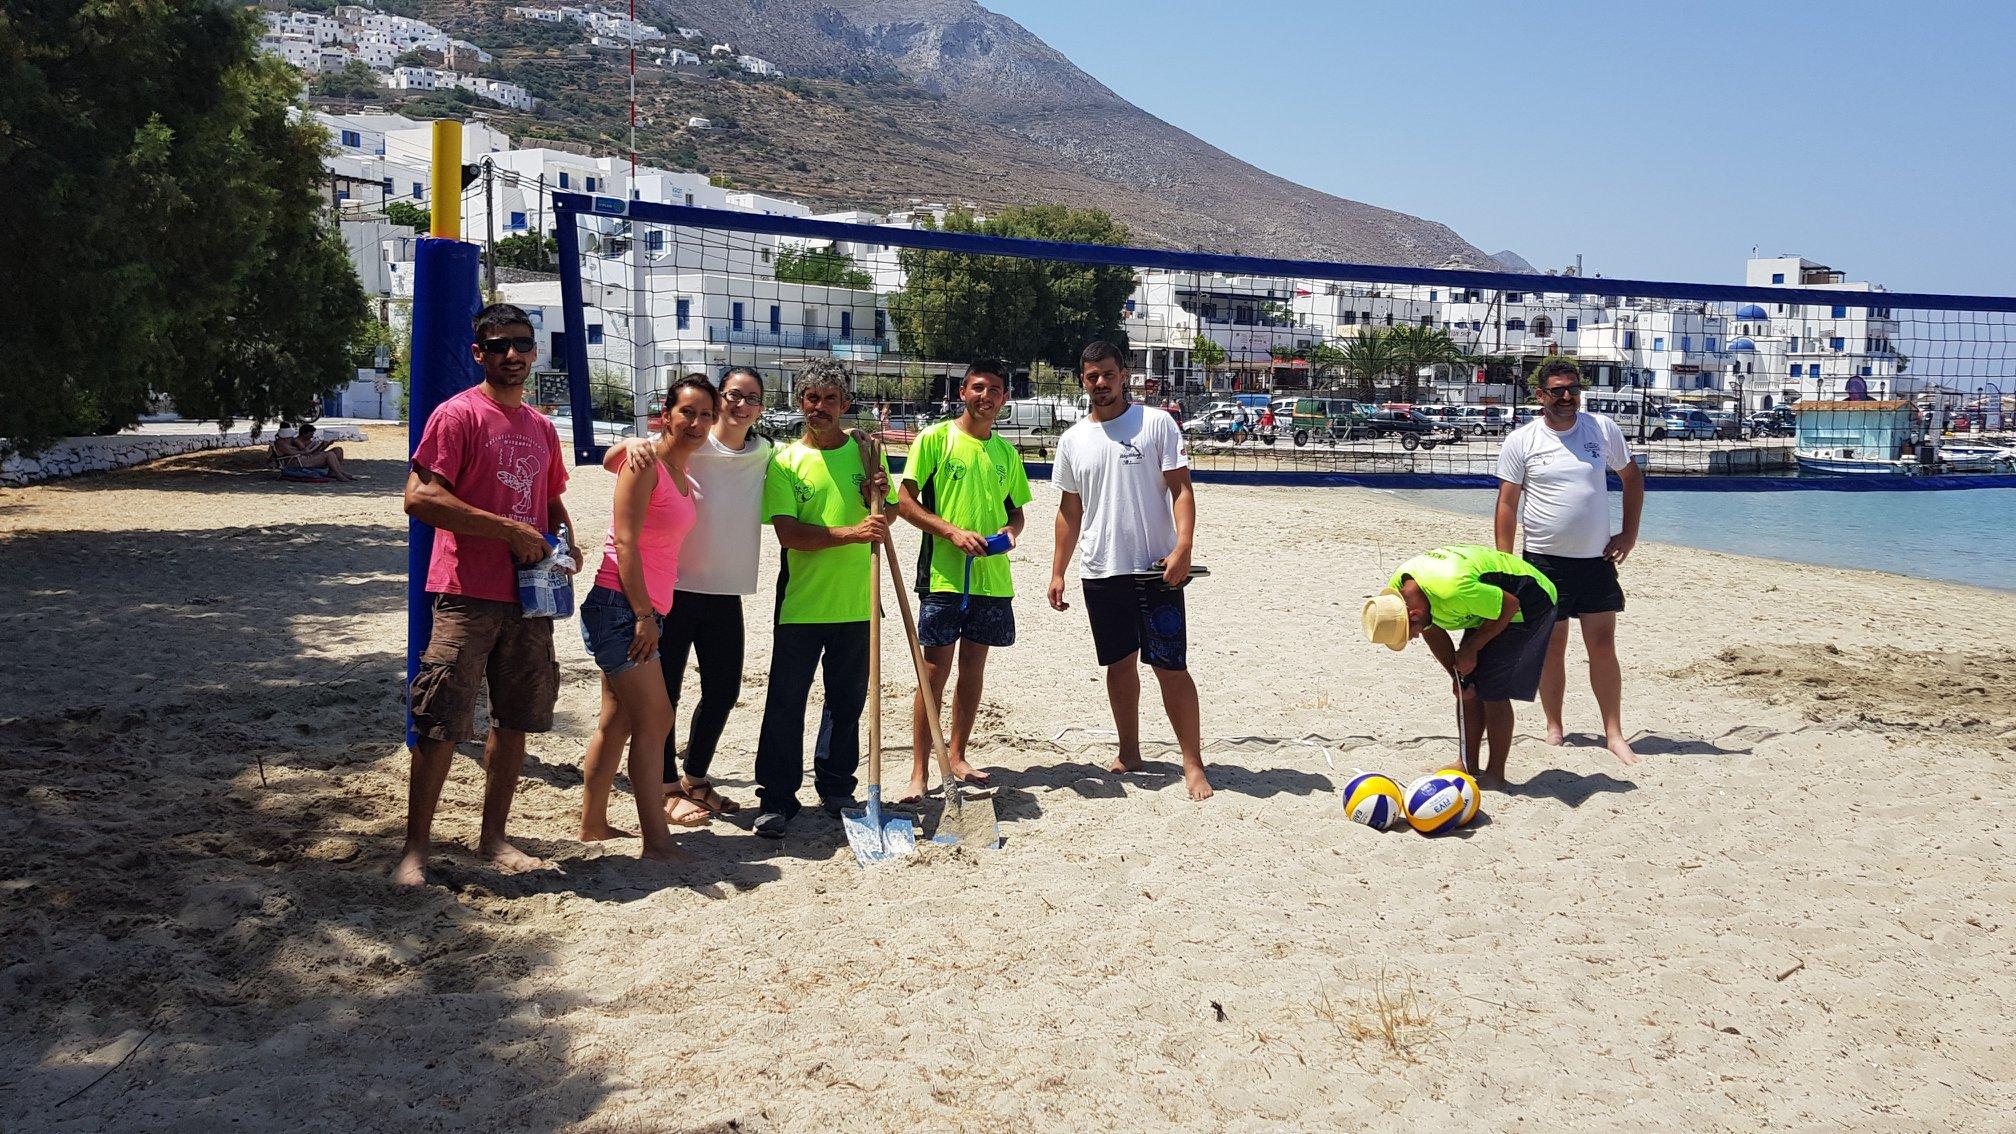 Beach Volley on the beach of Aegiali